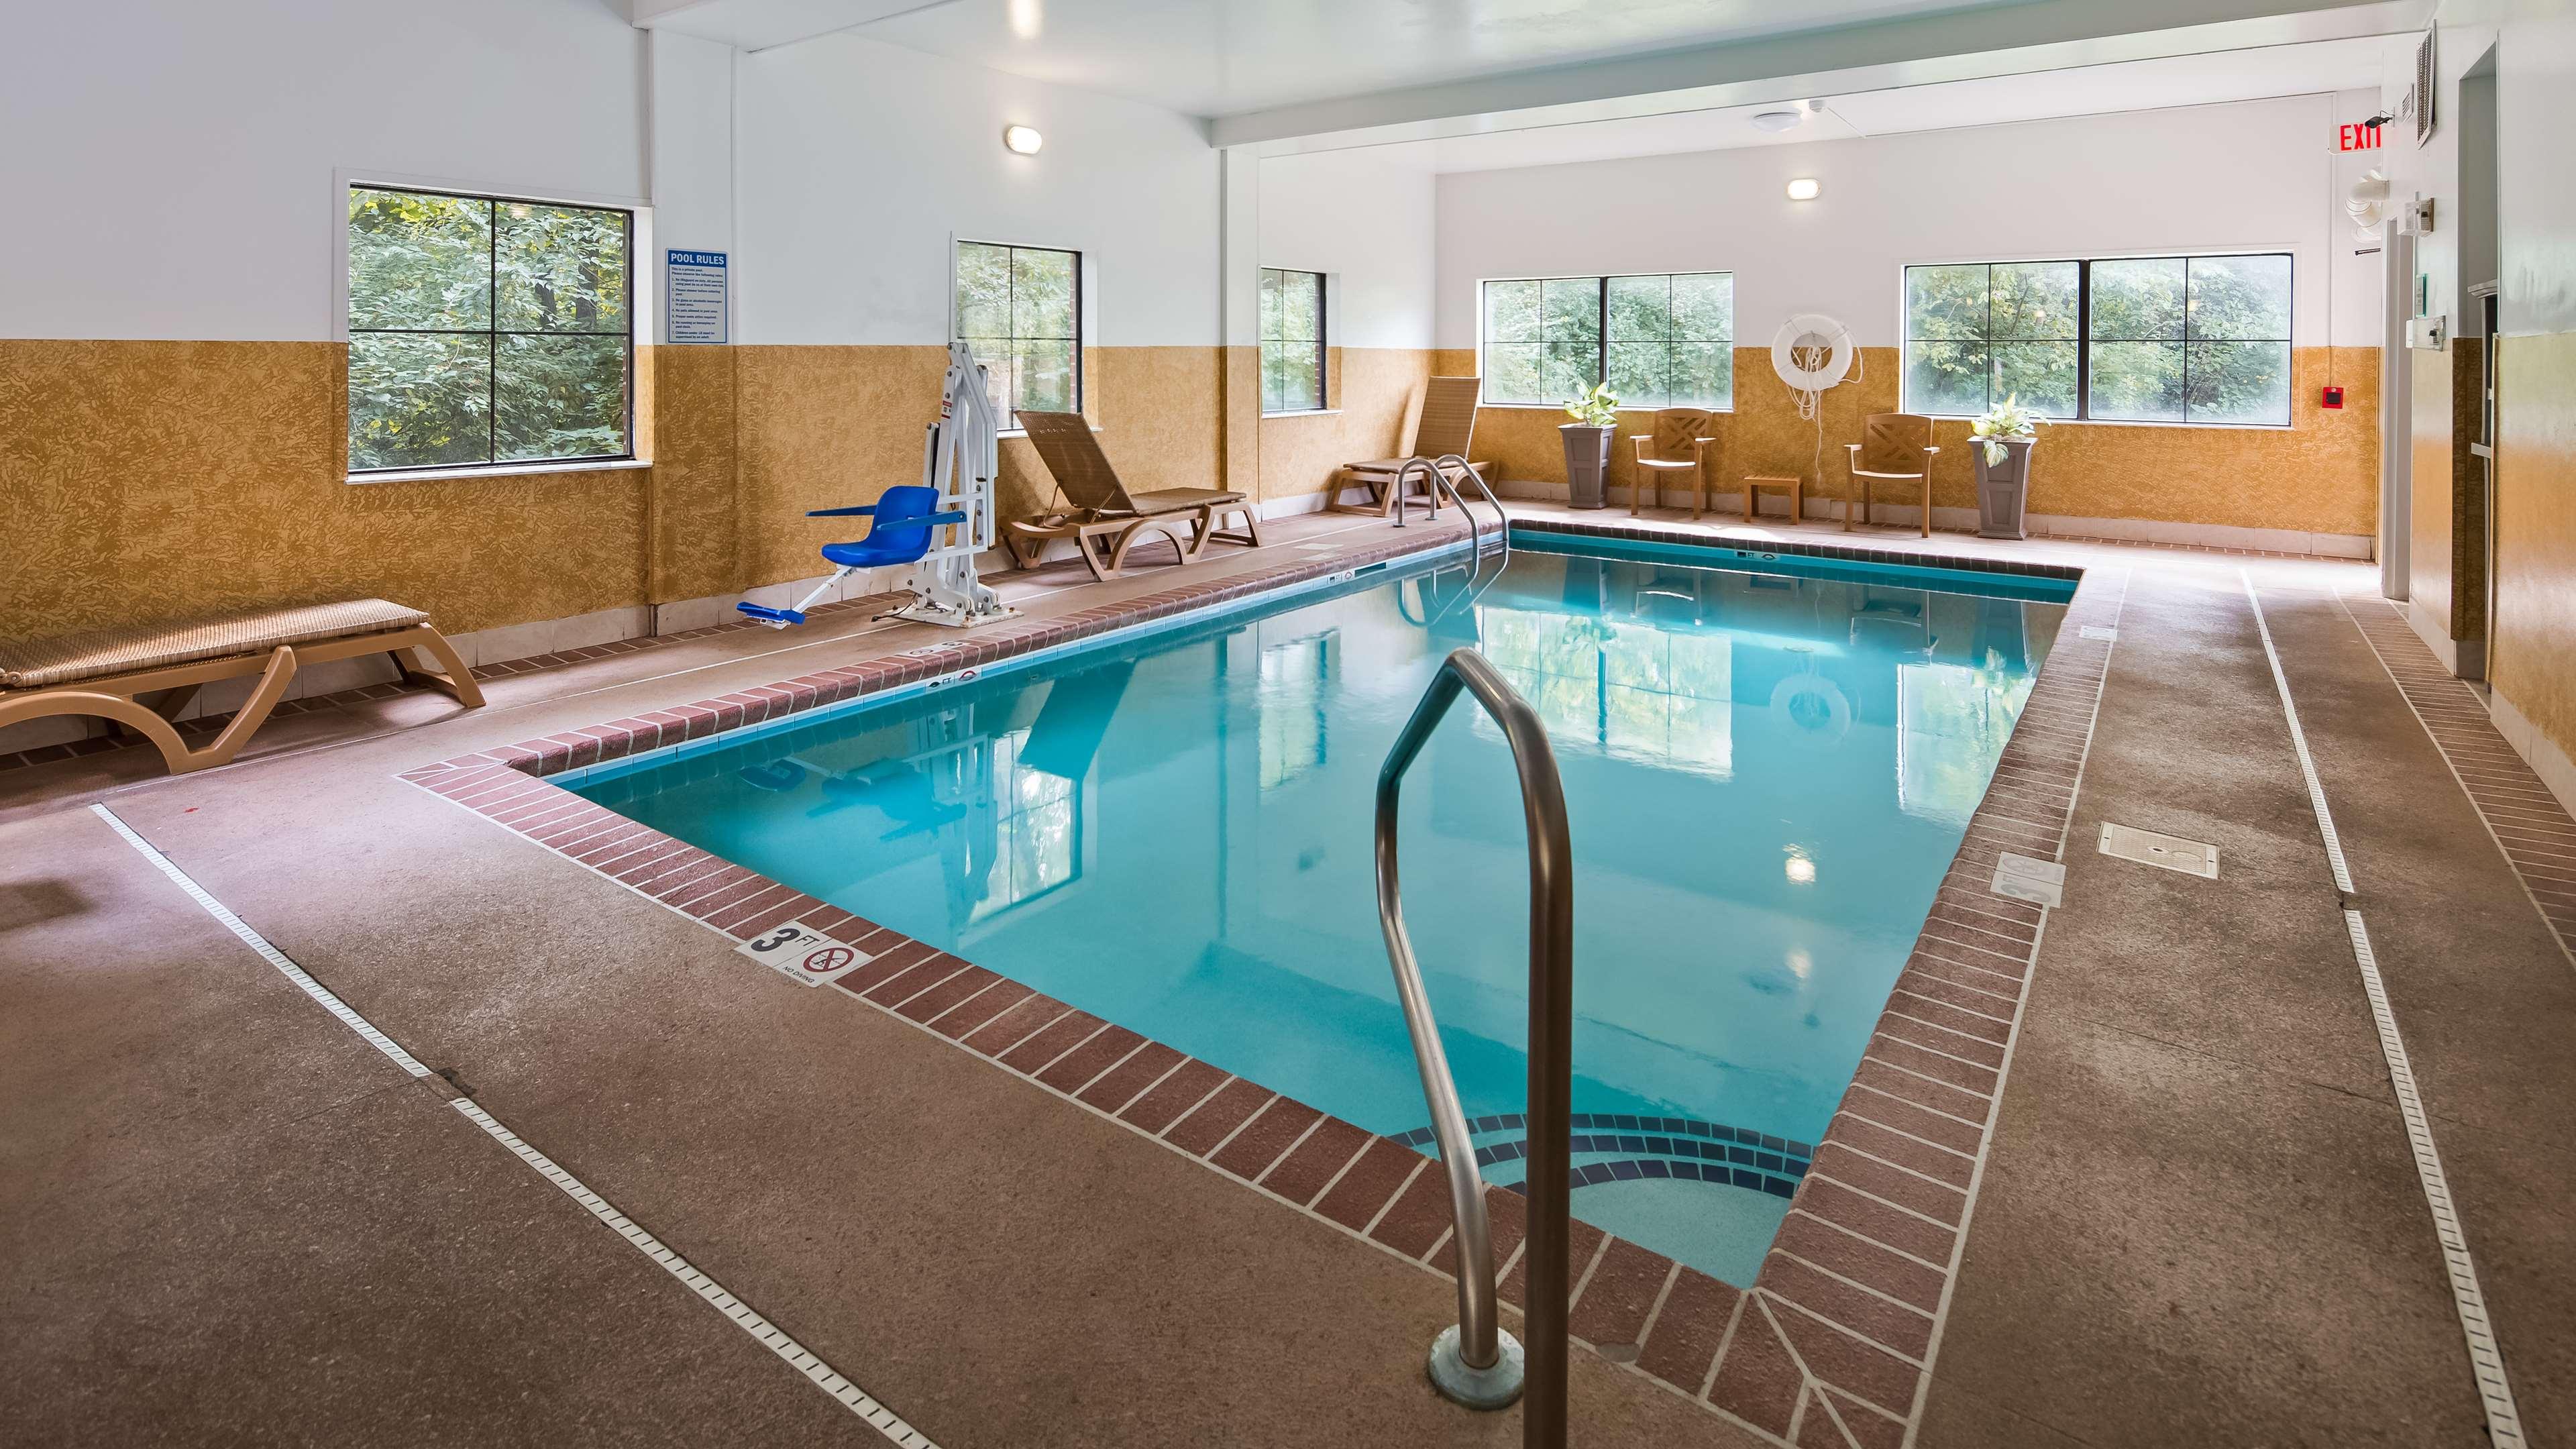 Best Western Executive Suites - Columbus East image 8